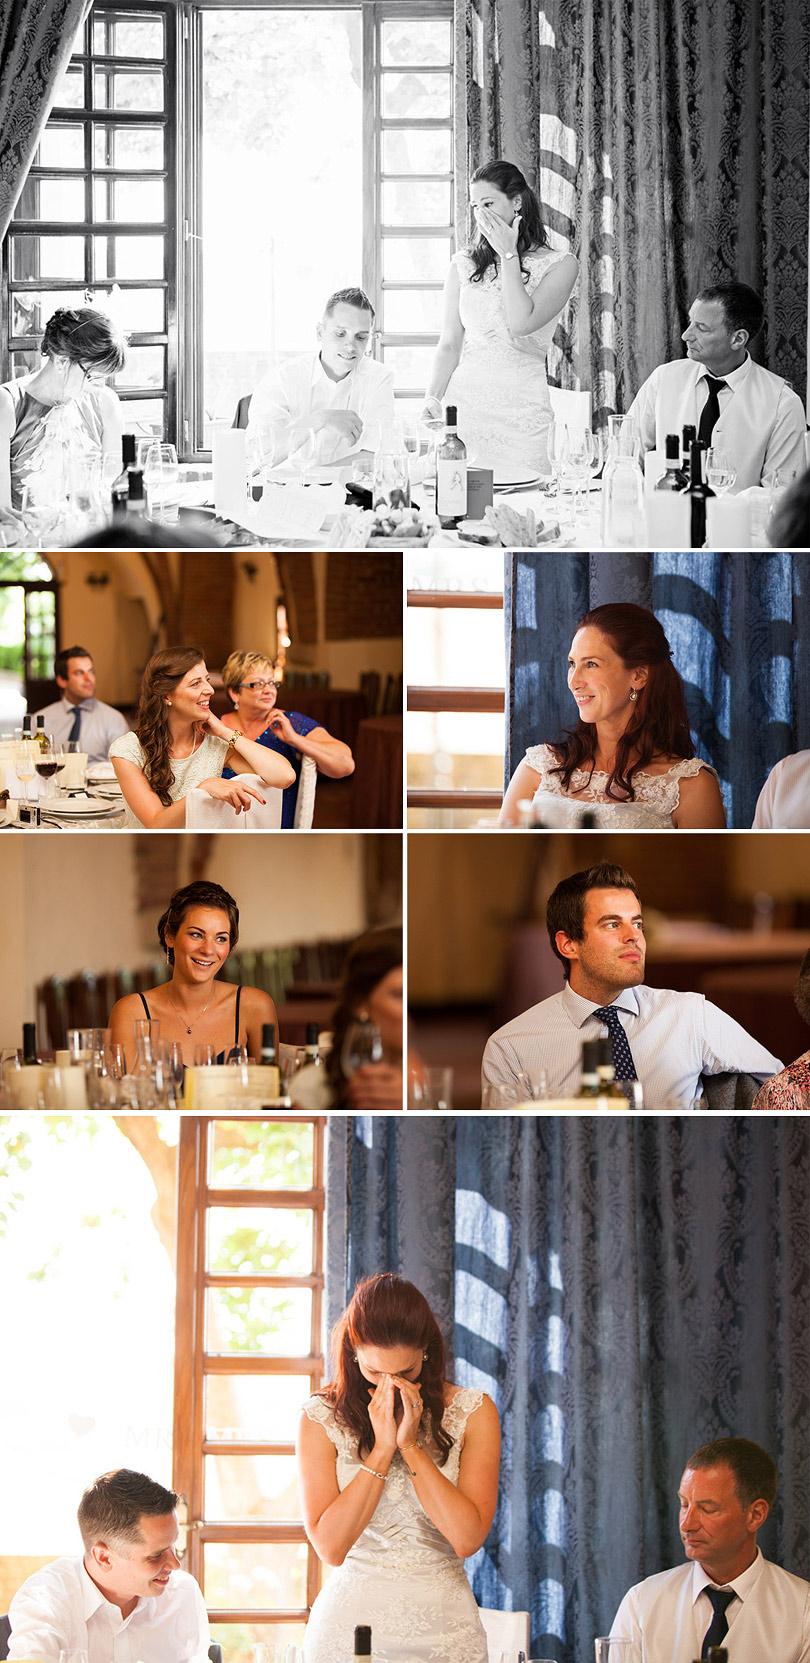 Castello-di-Cortanze-Italian-Wedding-LilyandFrankPhotography_28.jpg